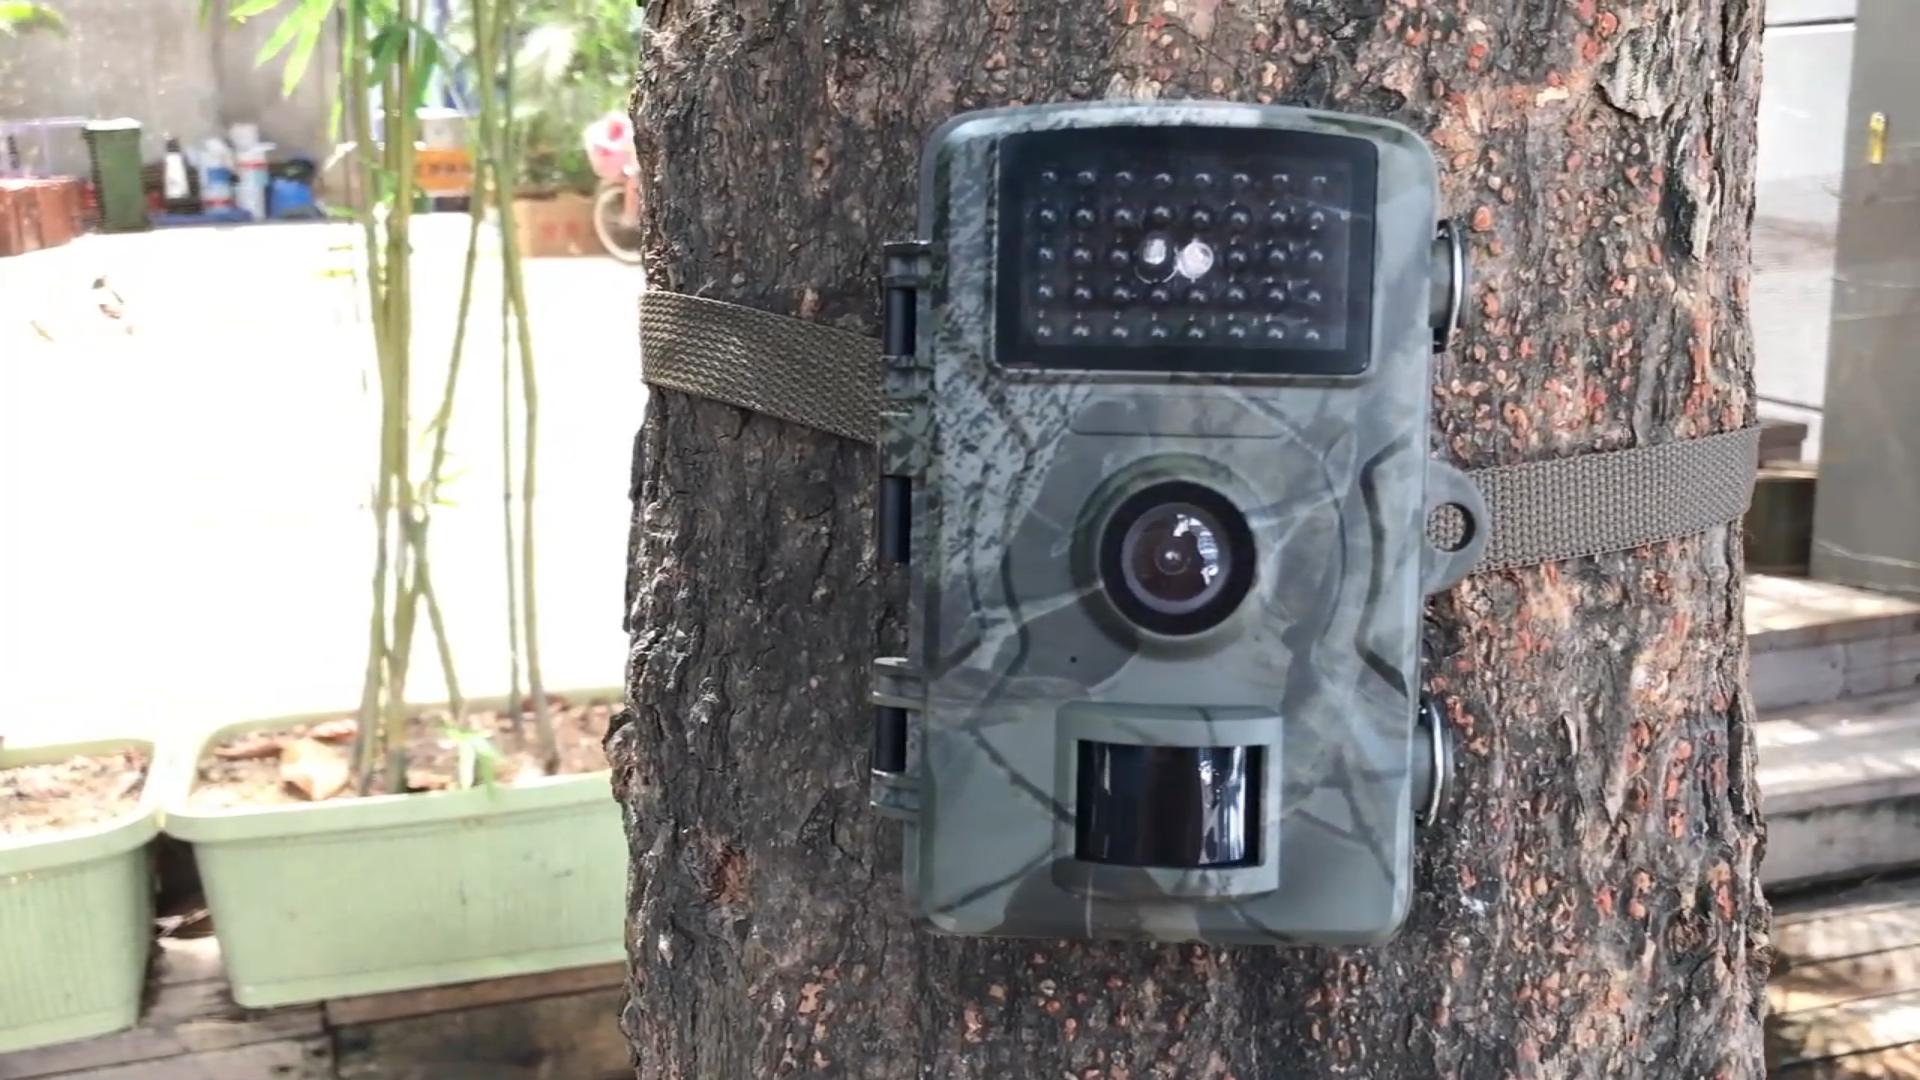 Animal Observation hunting camera   12MP 1080P Night Vision 15M  outdoor trail camera